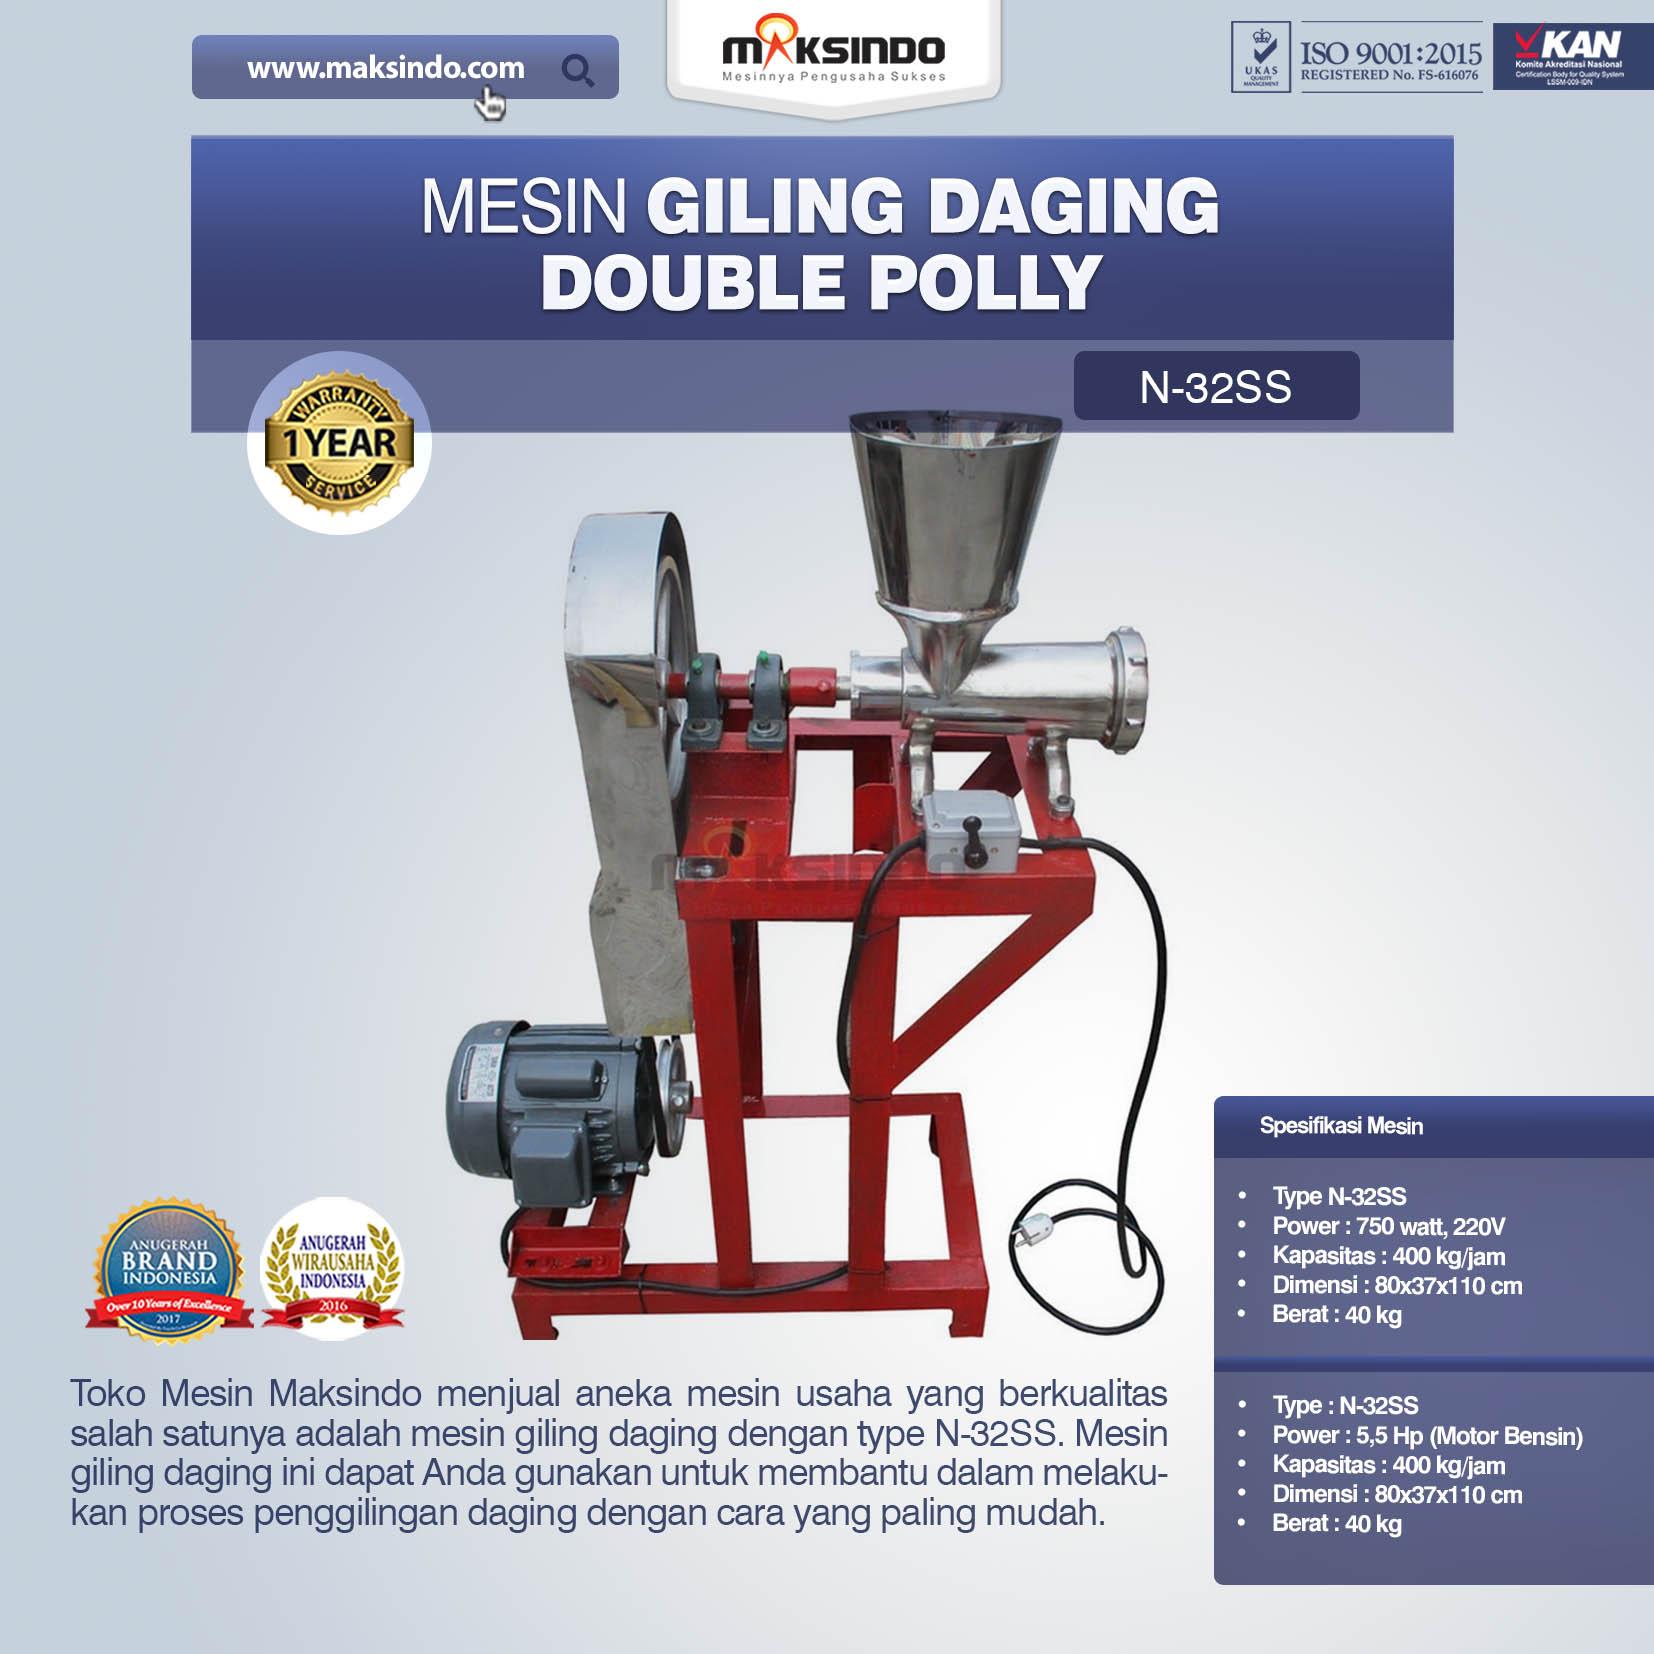 Jual Mesin Giling Daging Double Polly N-32SS di Malang